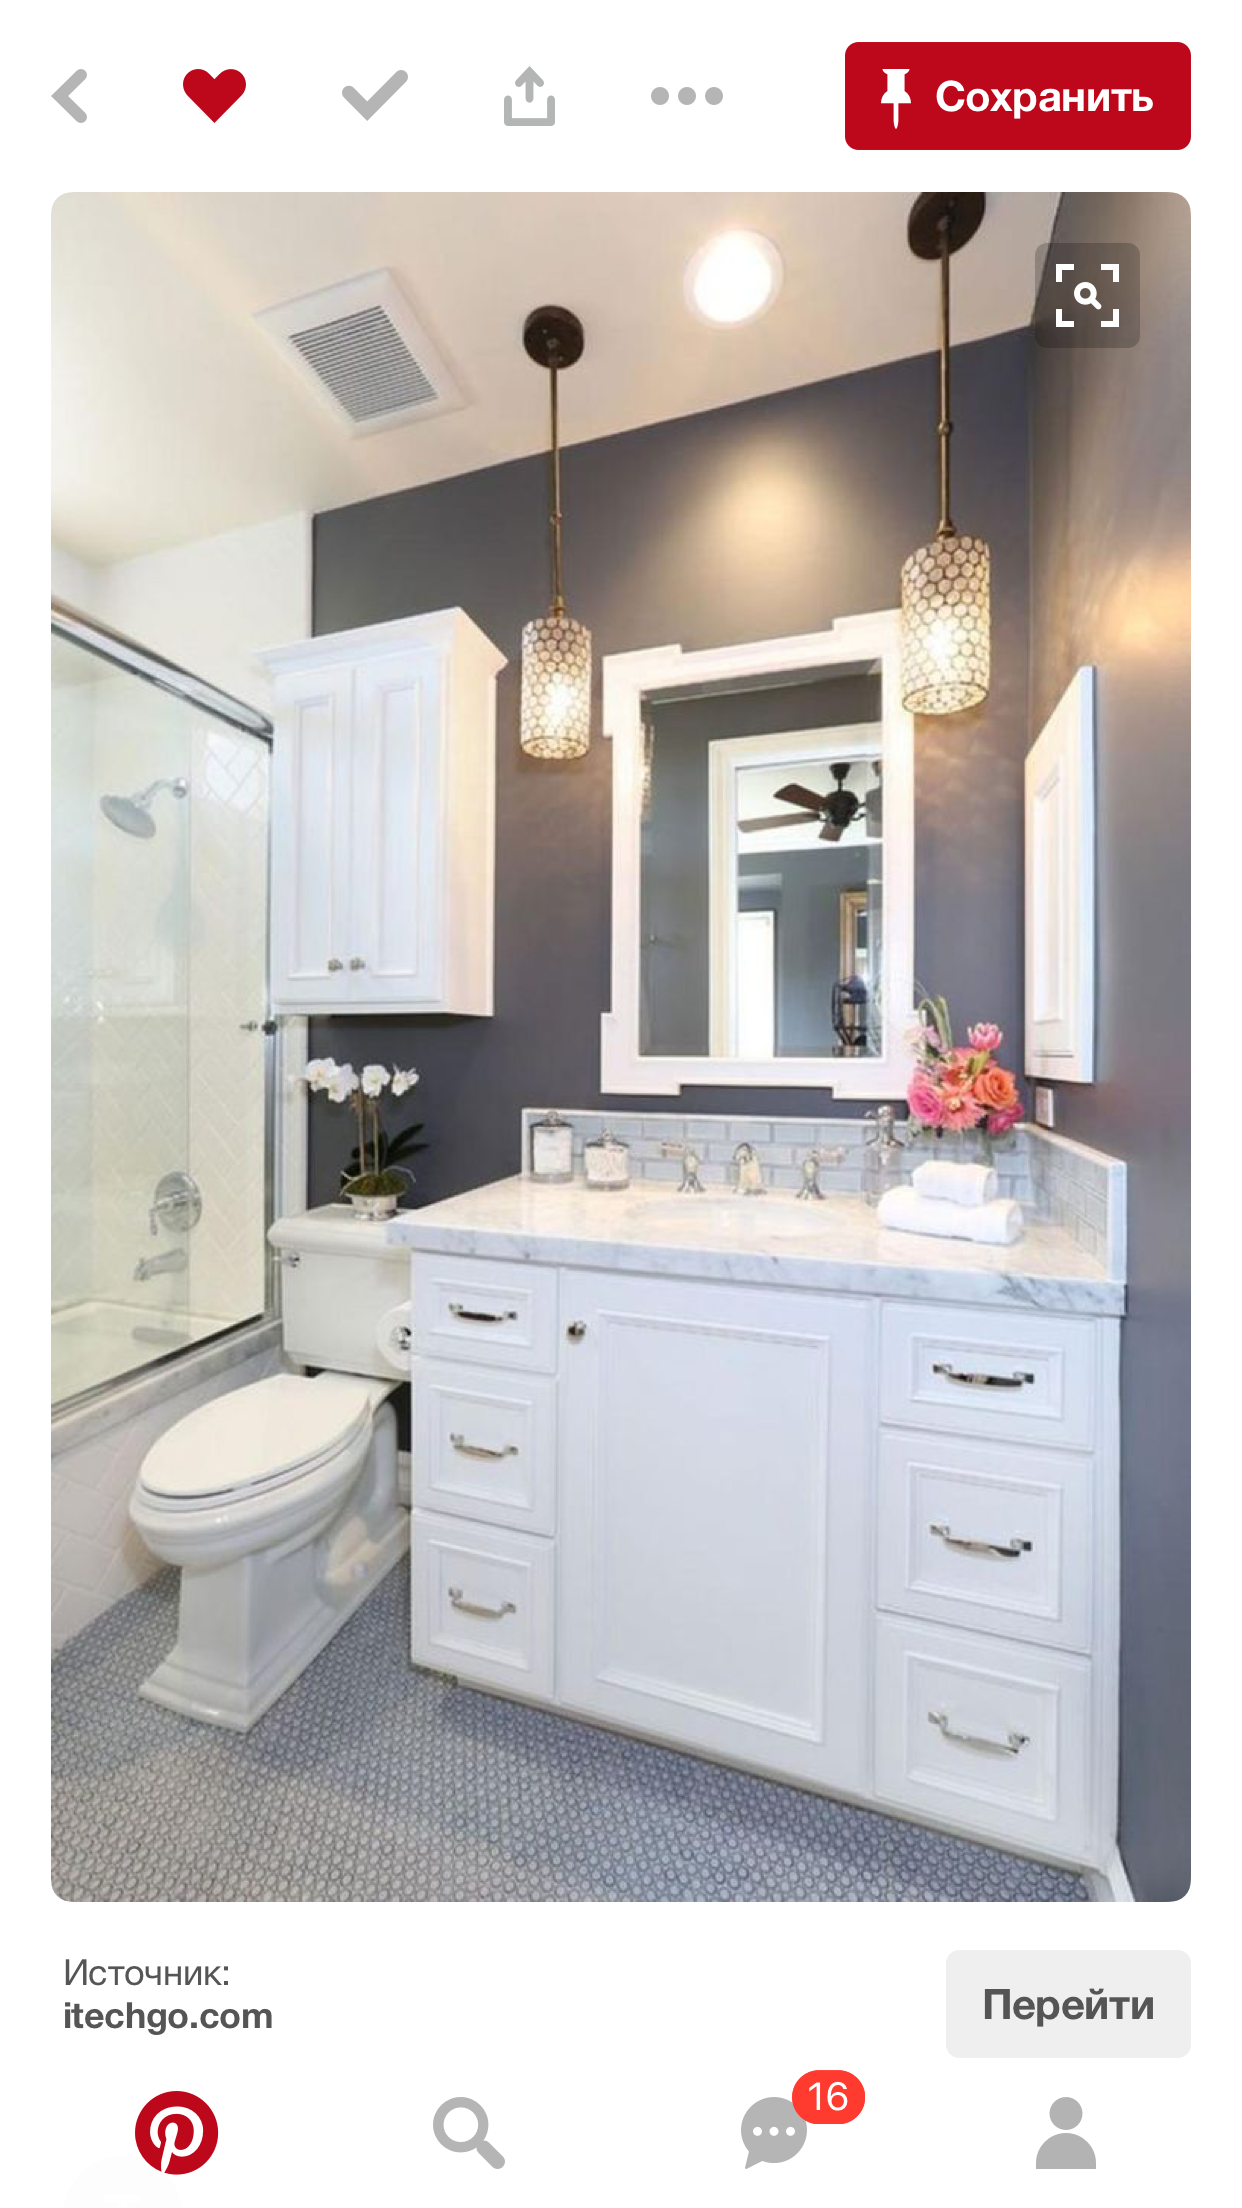 pin by maris cavanagh on remodel storage ideas in 2019 bathroom rh pinterest com